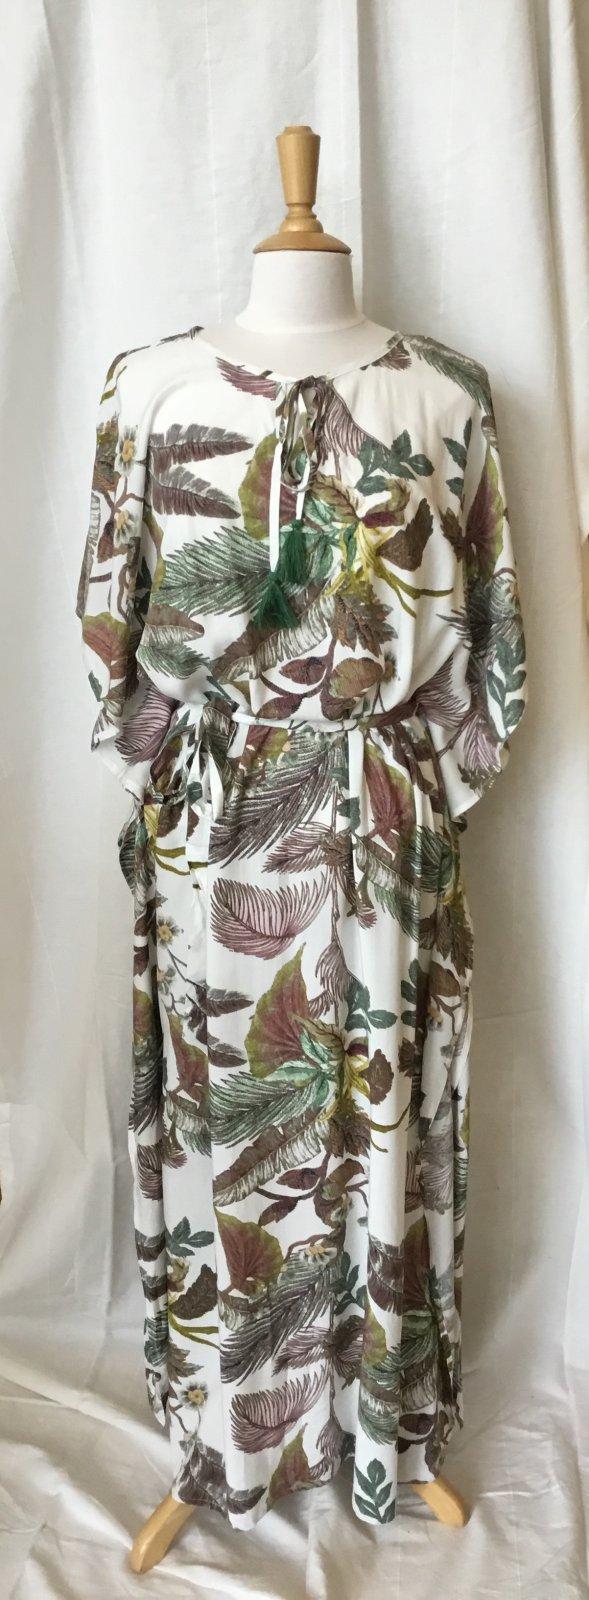 Sisters Tropical Maxi Dress